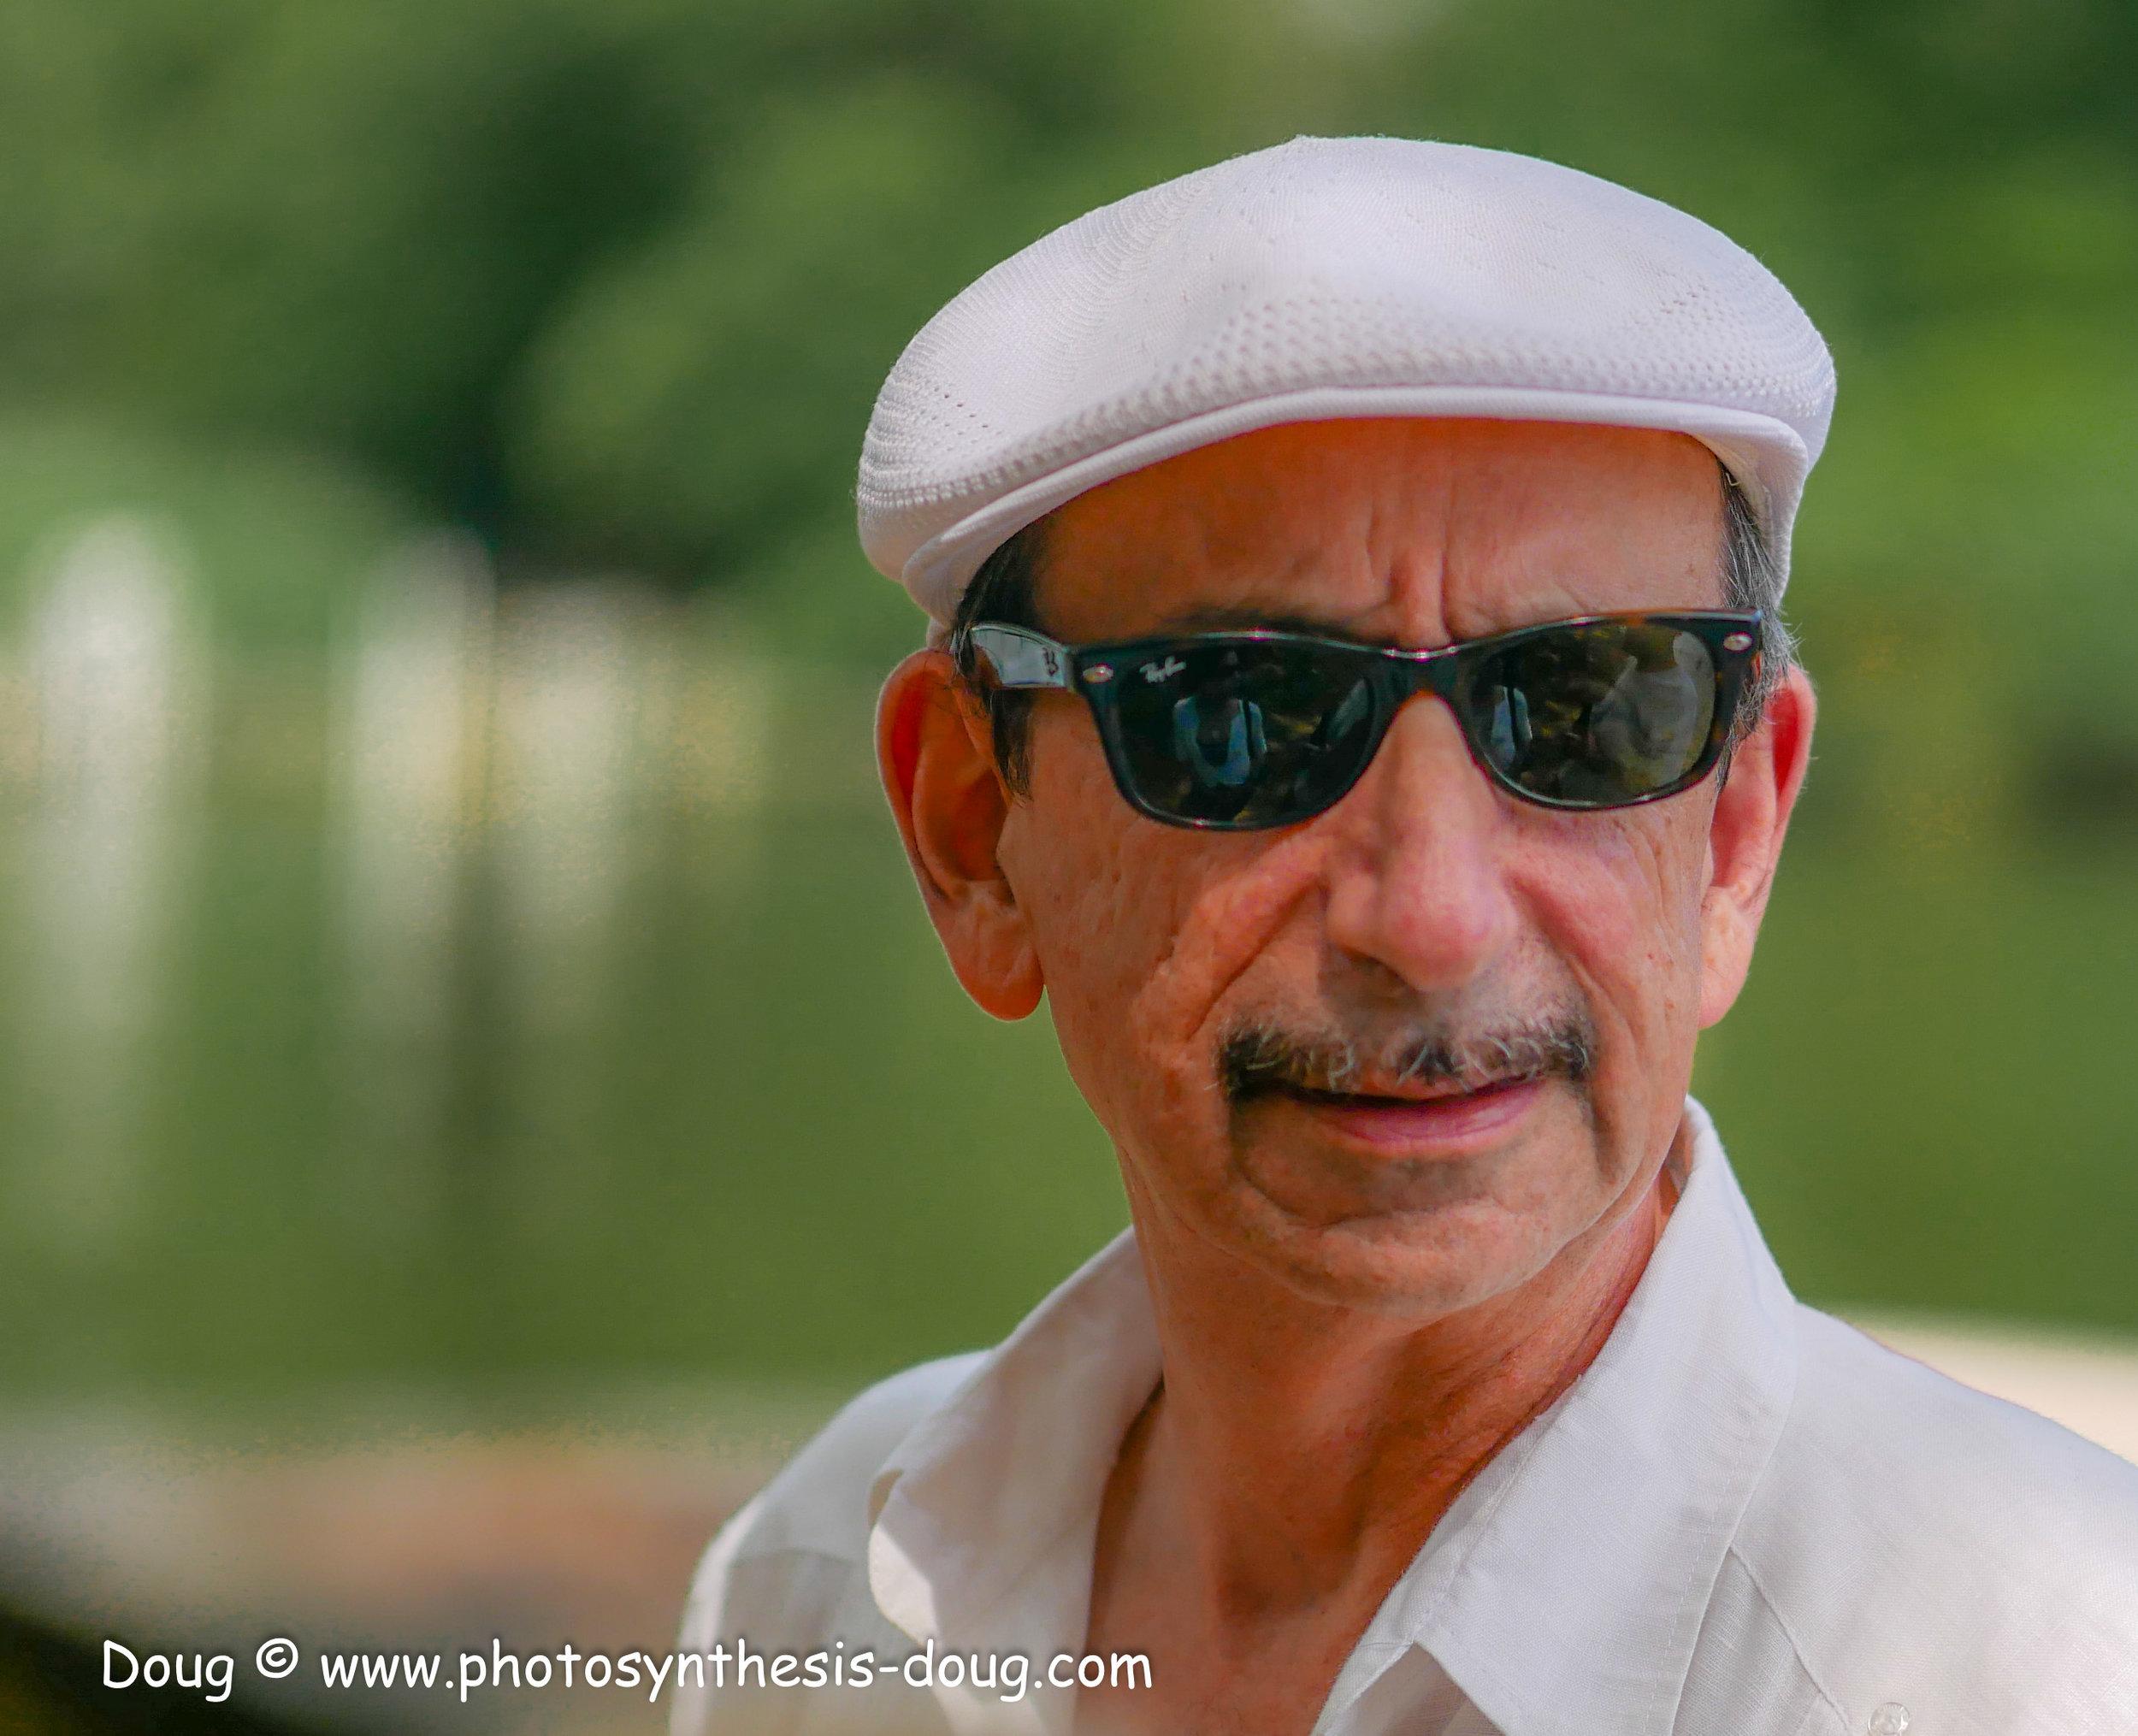 great portrait - Andy-1040617.JPG